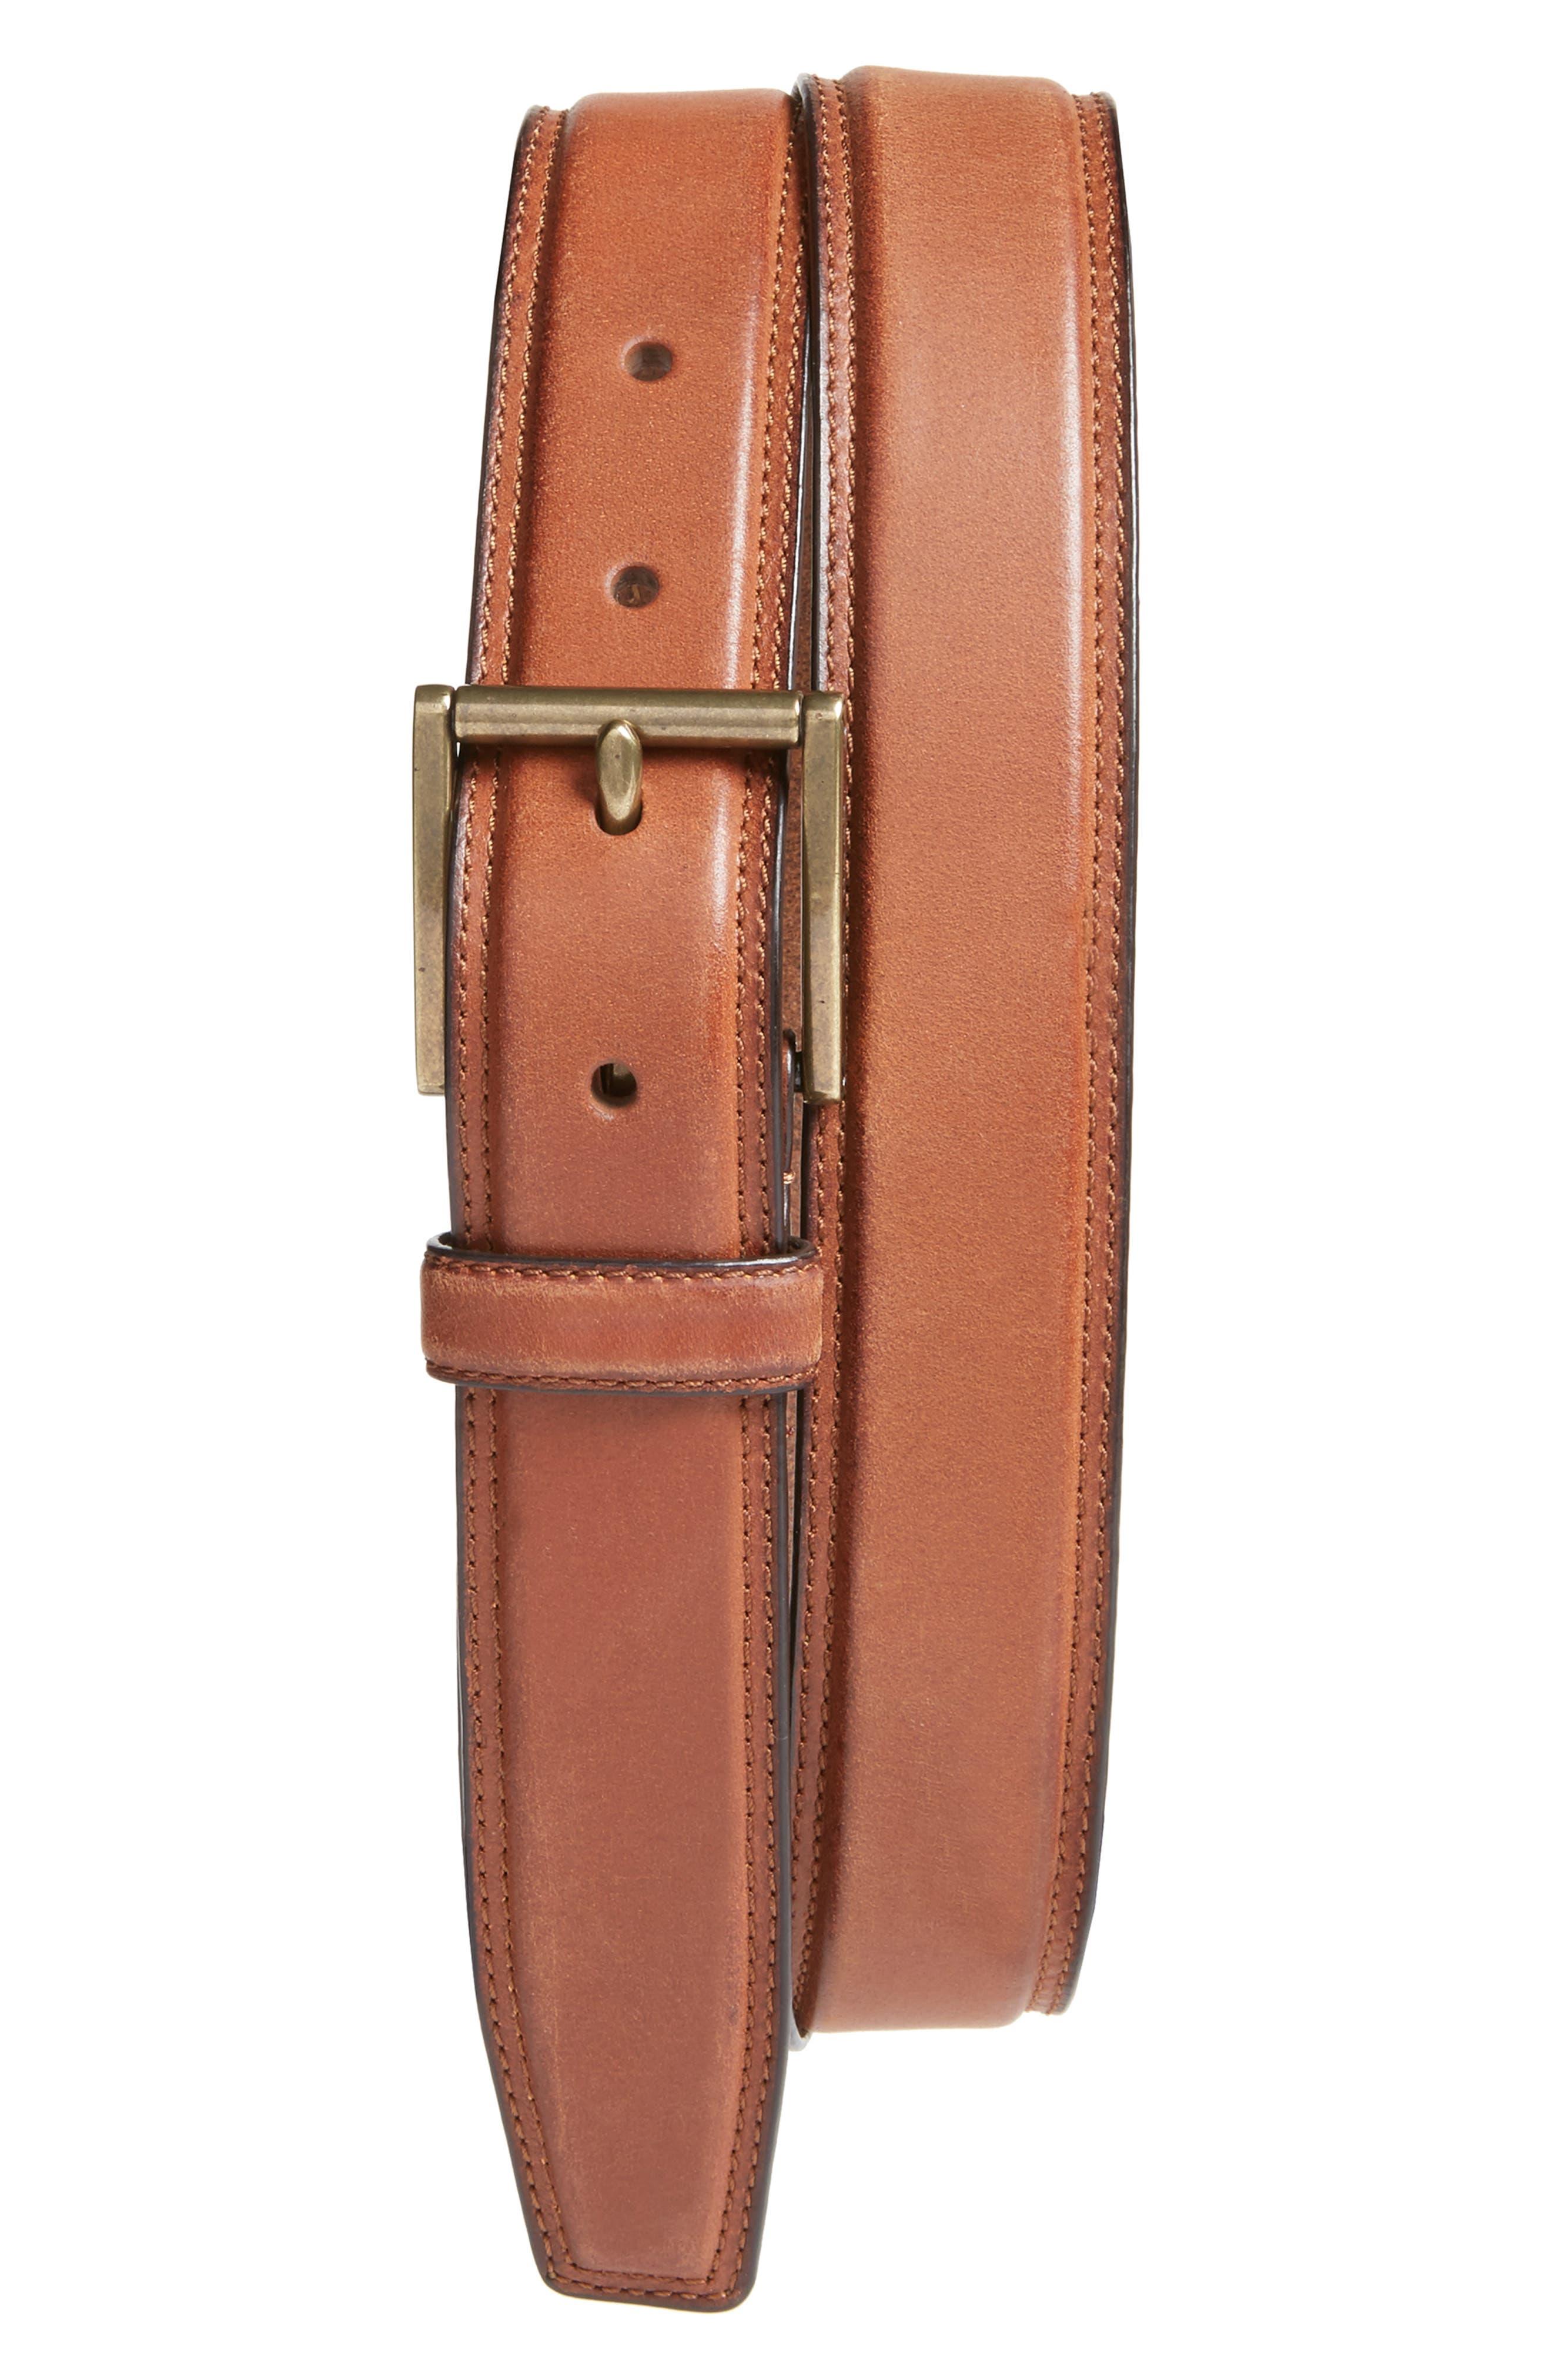 COLE HAAN, Leather Belt, Main thumbnail 1, color, 201